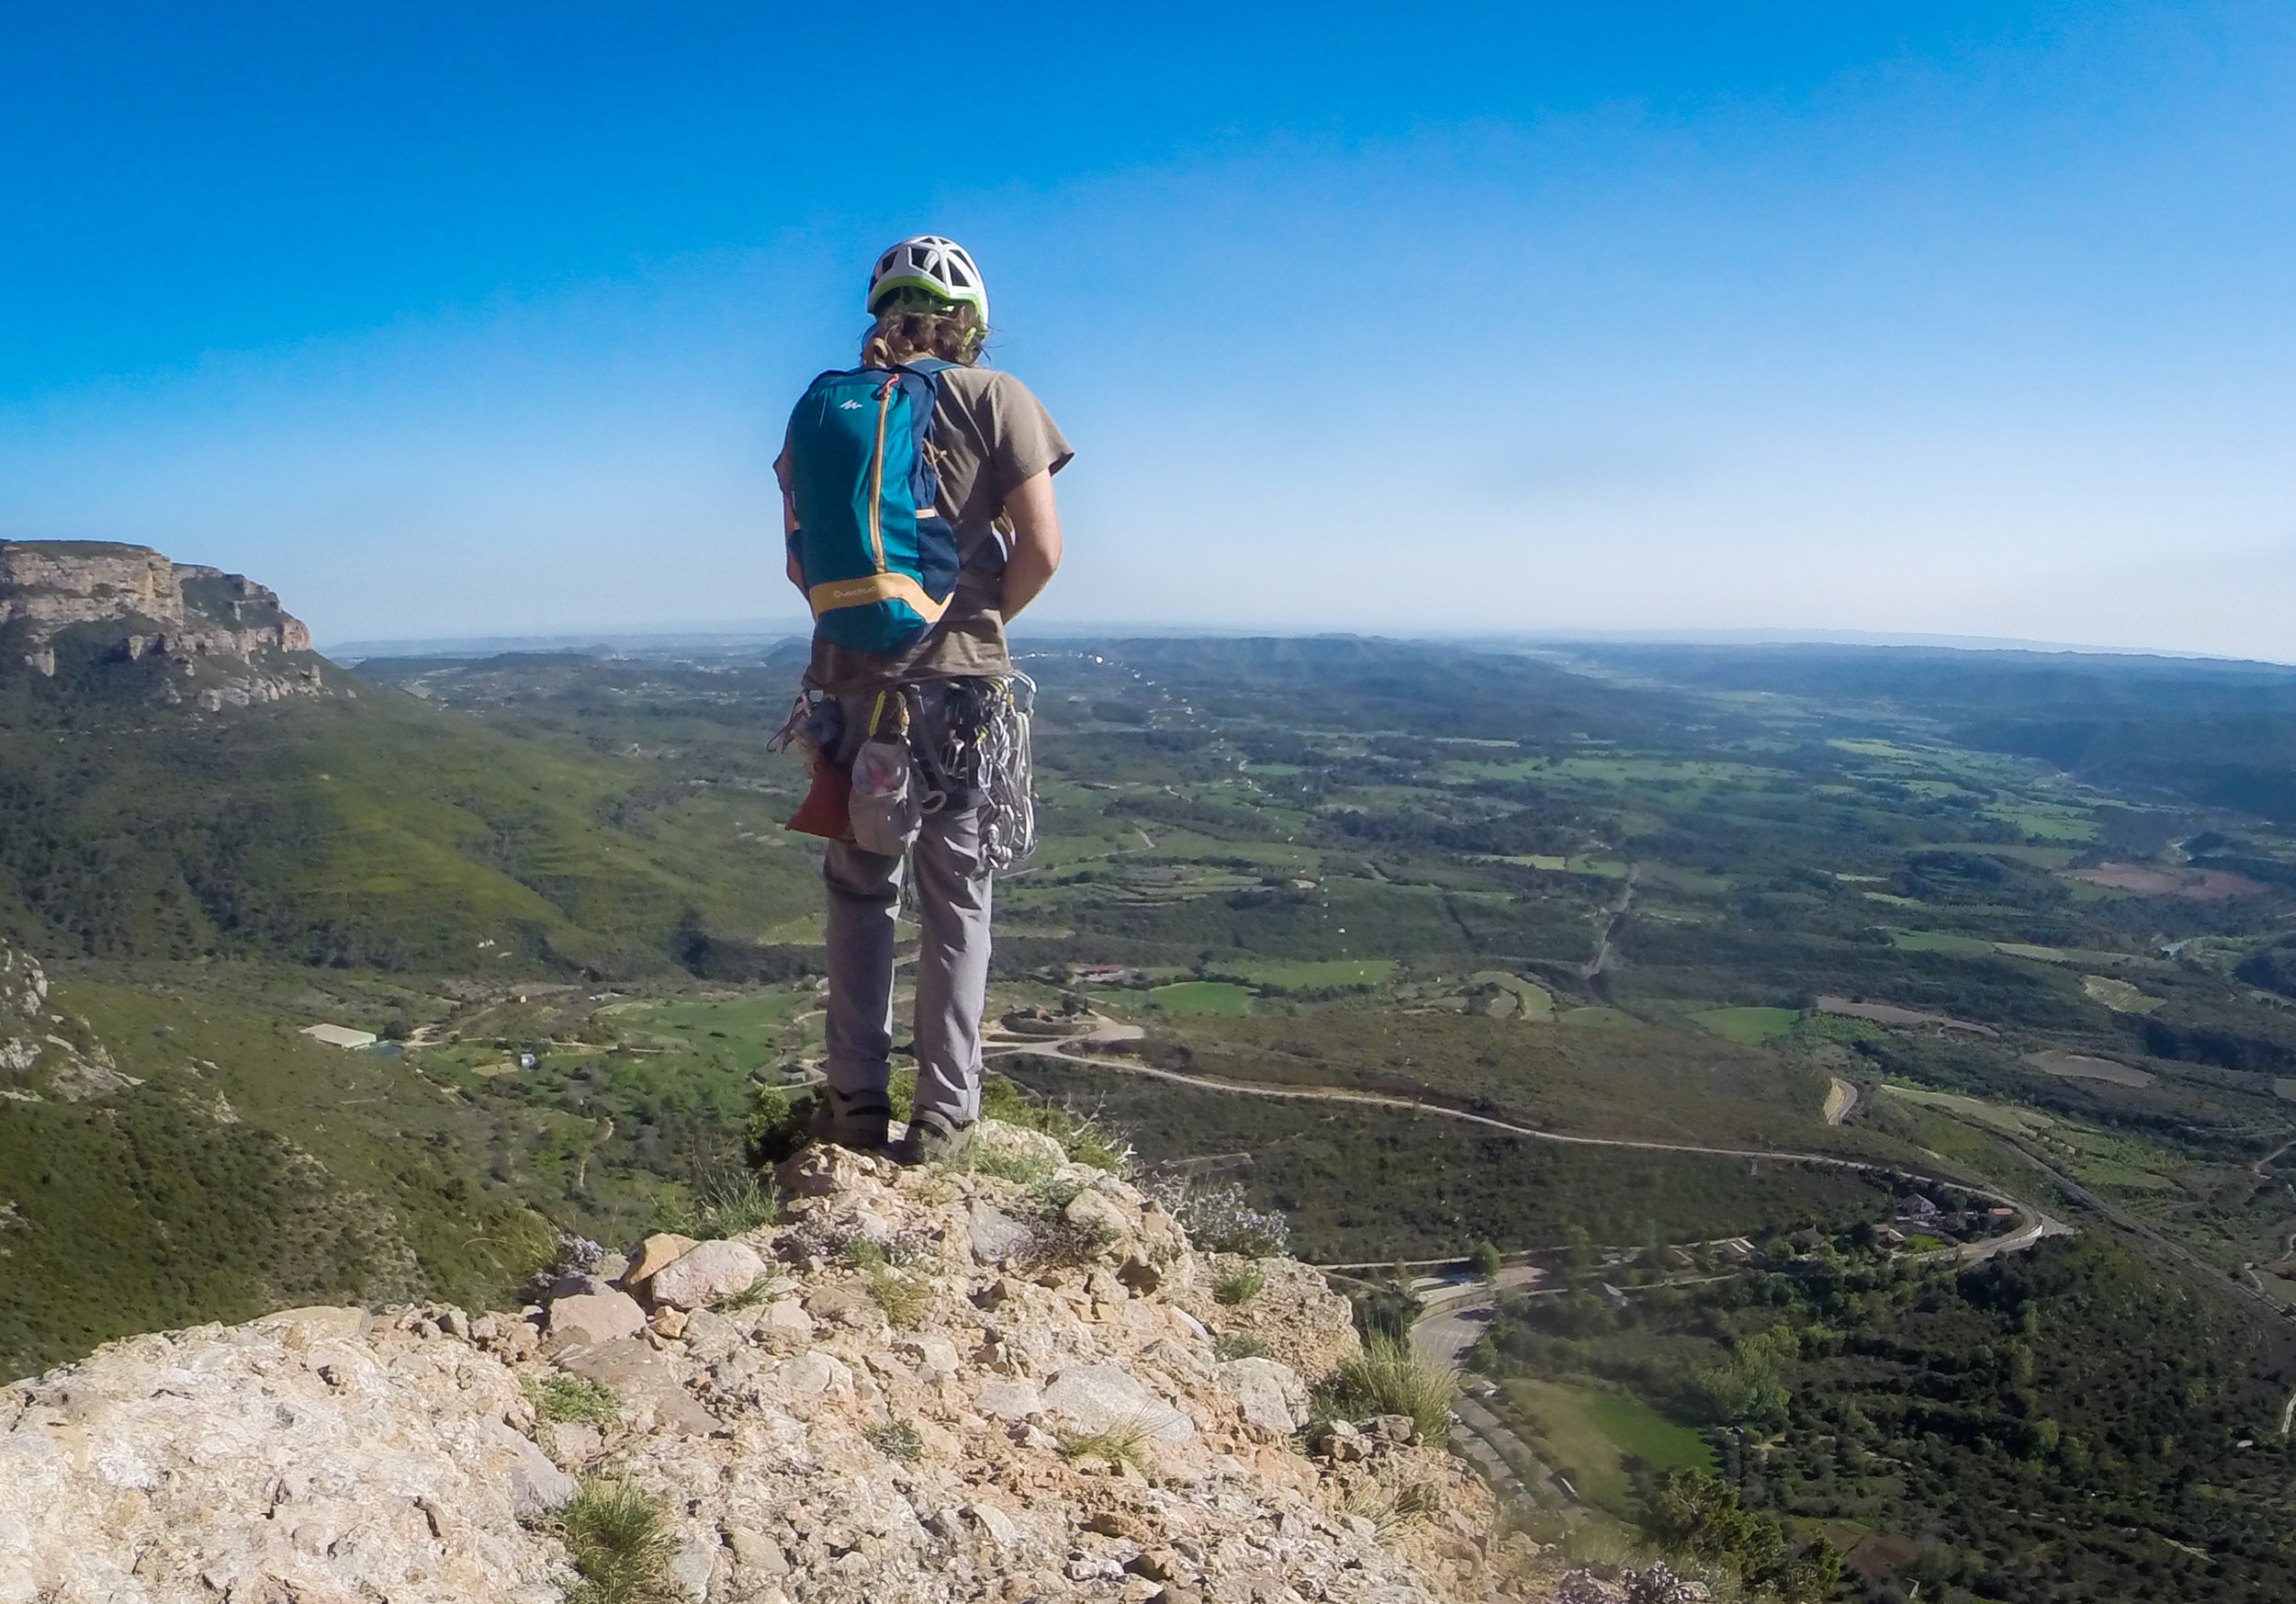 climbinginspain-18.jpg